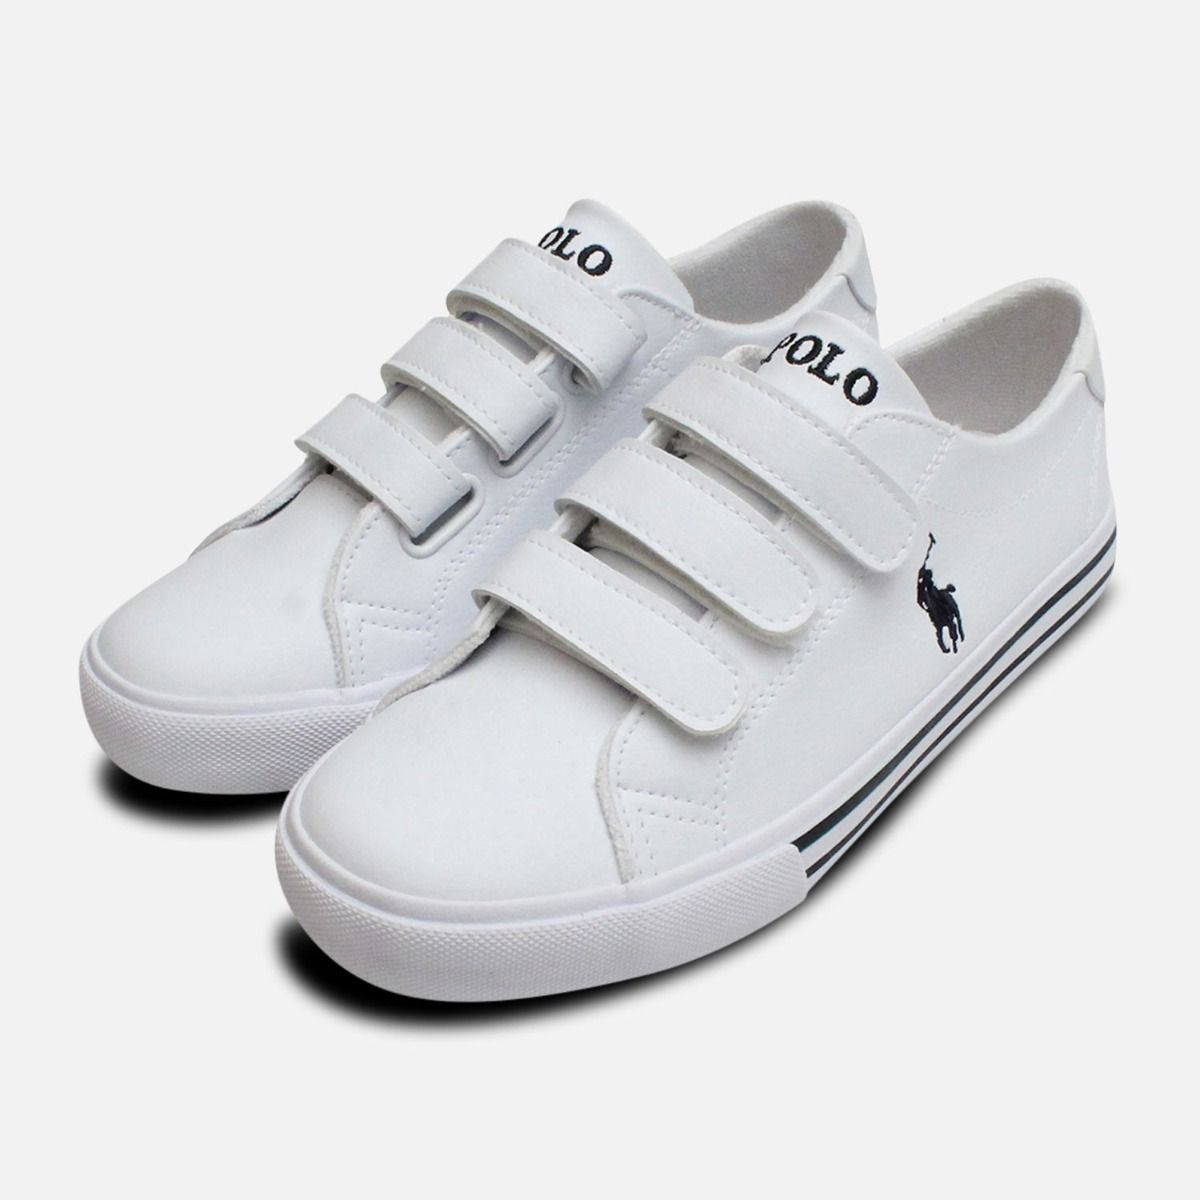 0bb9c70ac20a White Ralph Lauren Polo Slater EZ Kids Shoes